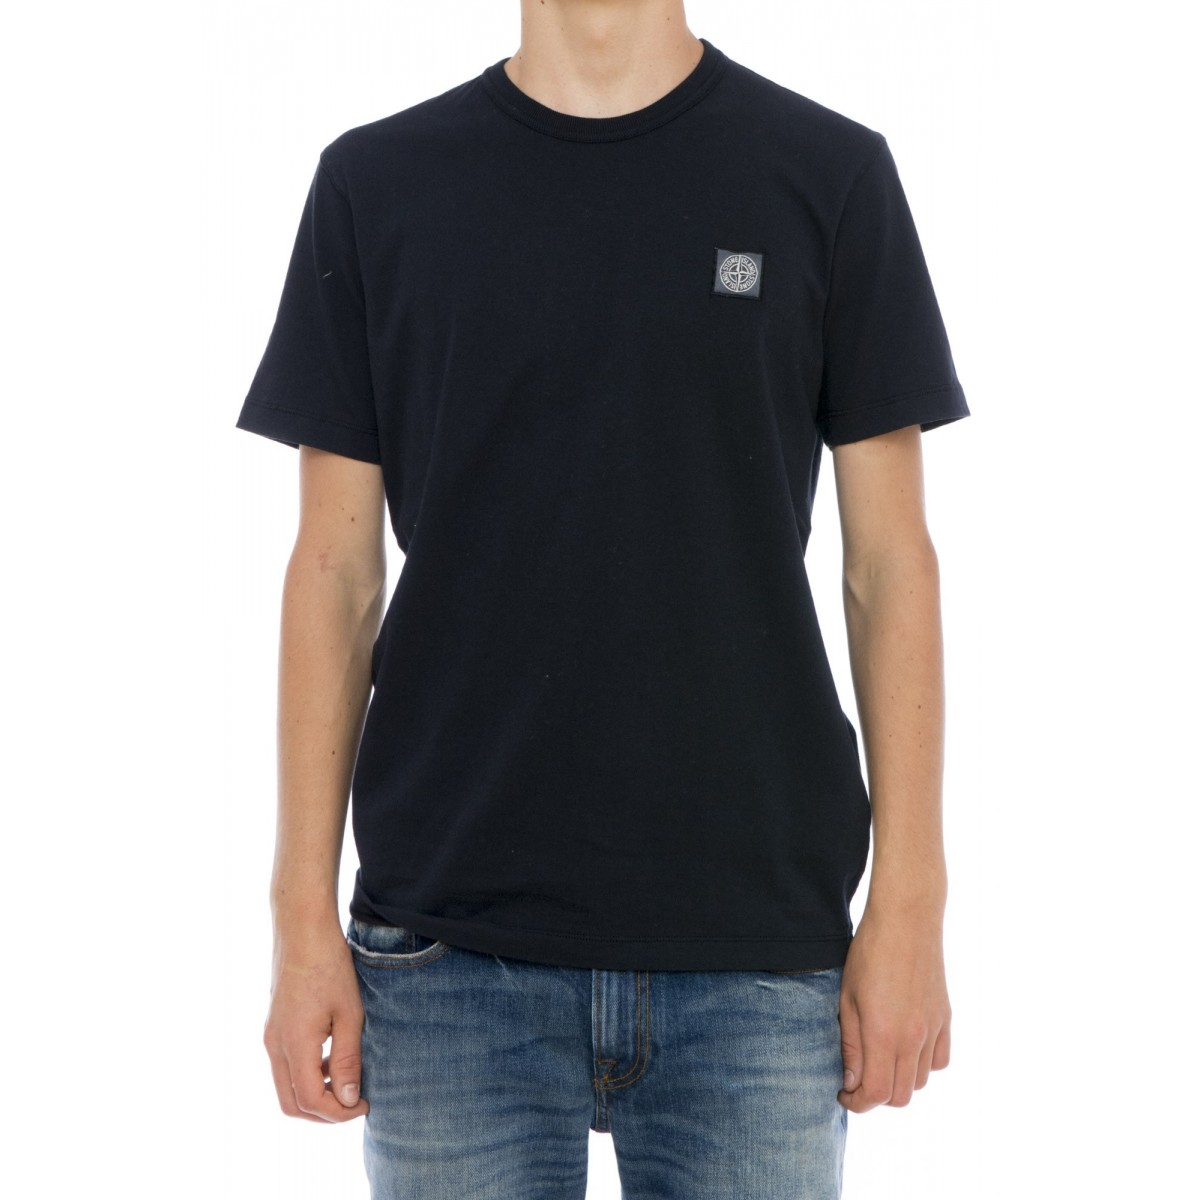 T-shirt uomo Stone island - 21142 t-shirt cotone fiammato